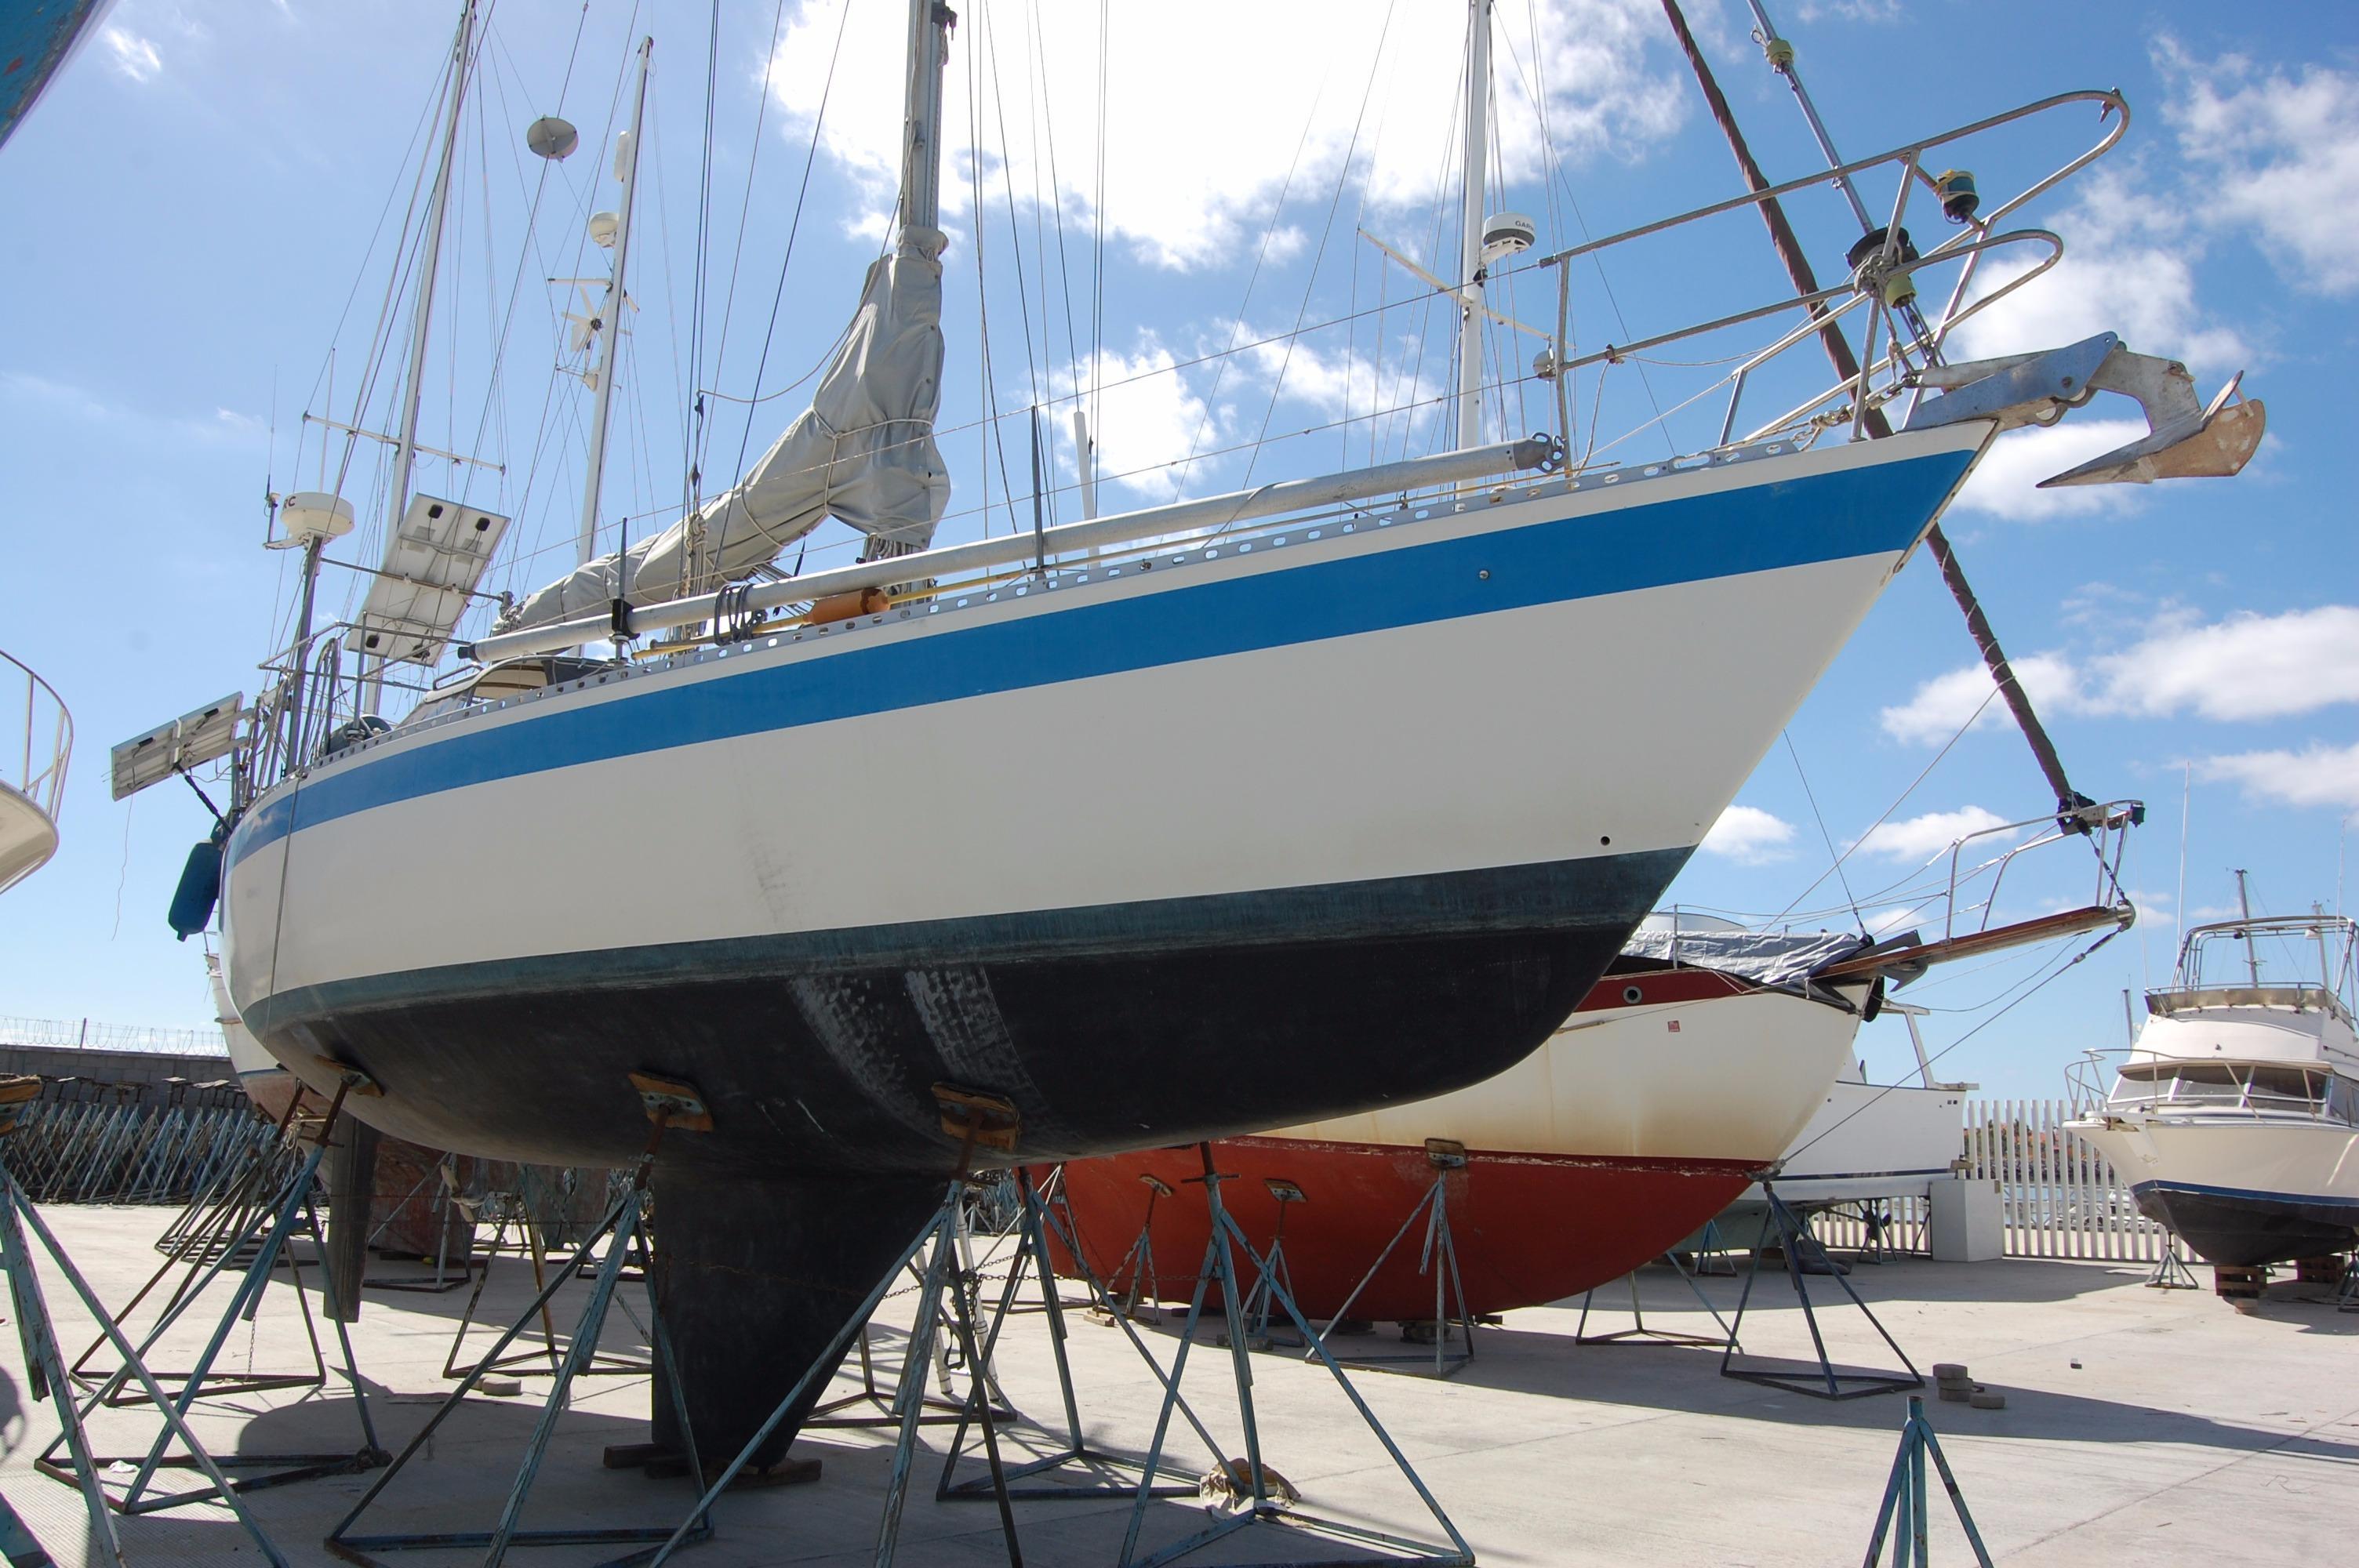 35' Wauquiez Pretorien+Boat for sale!